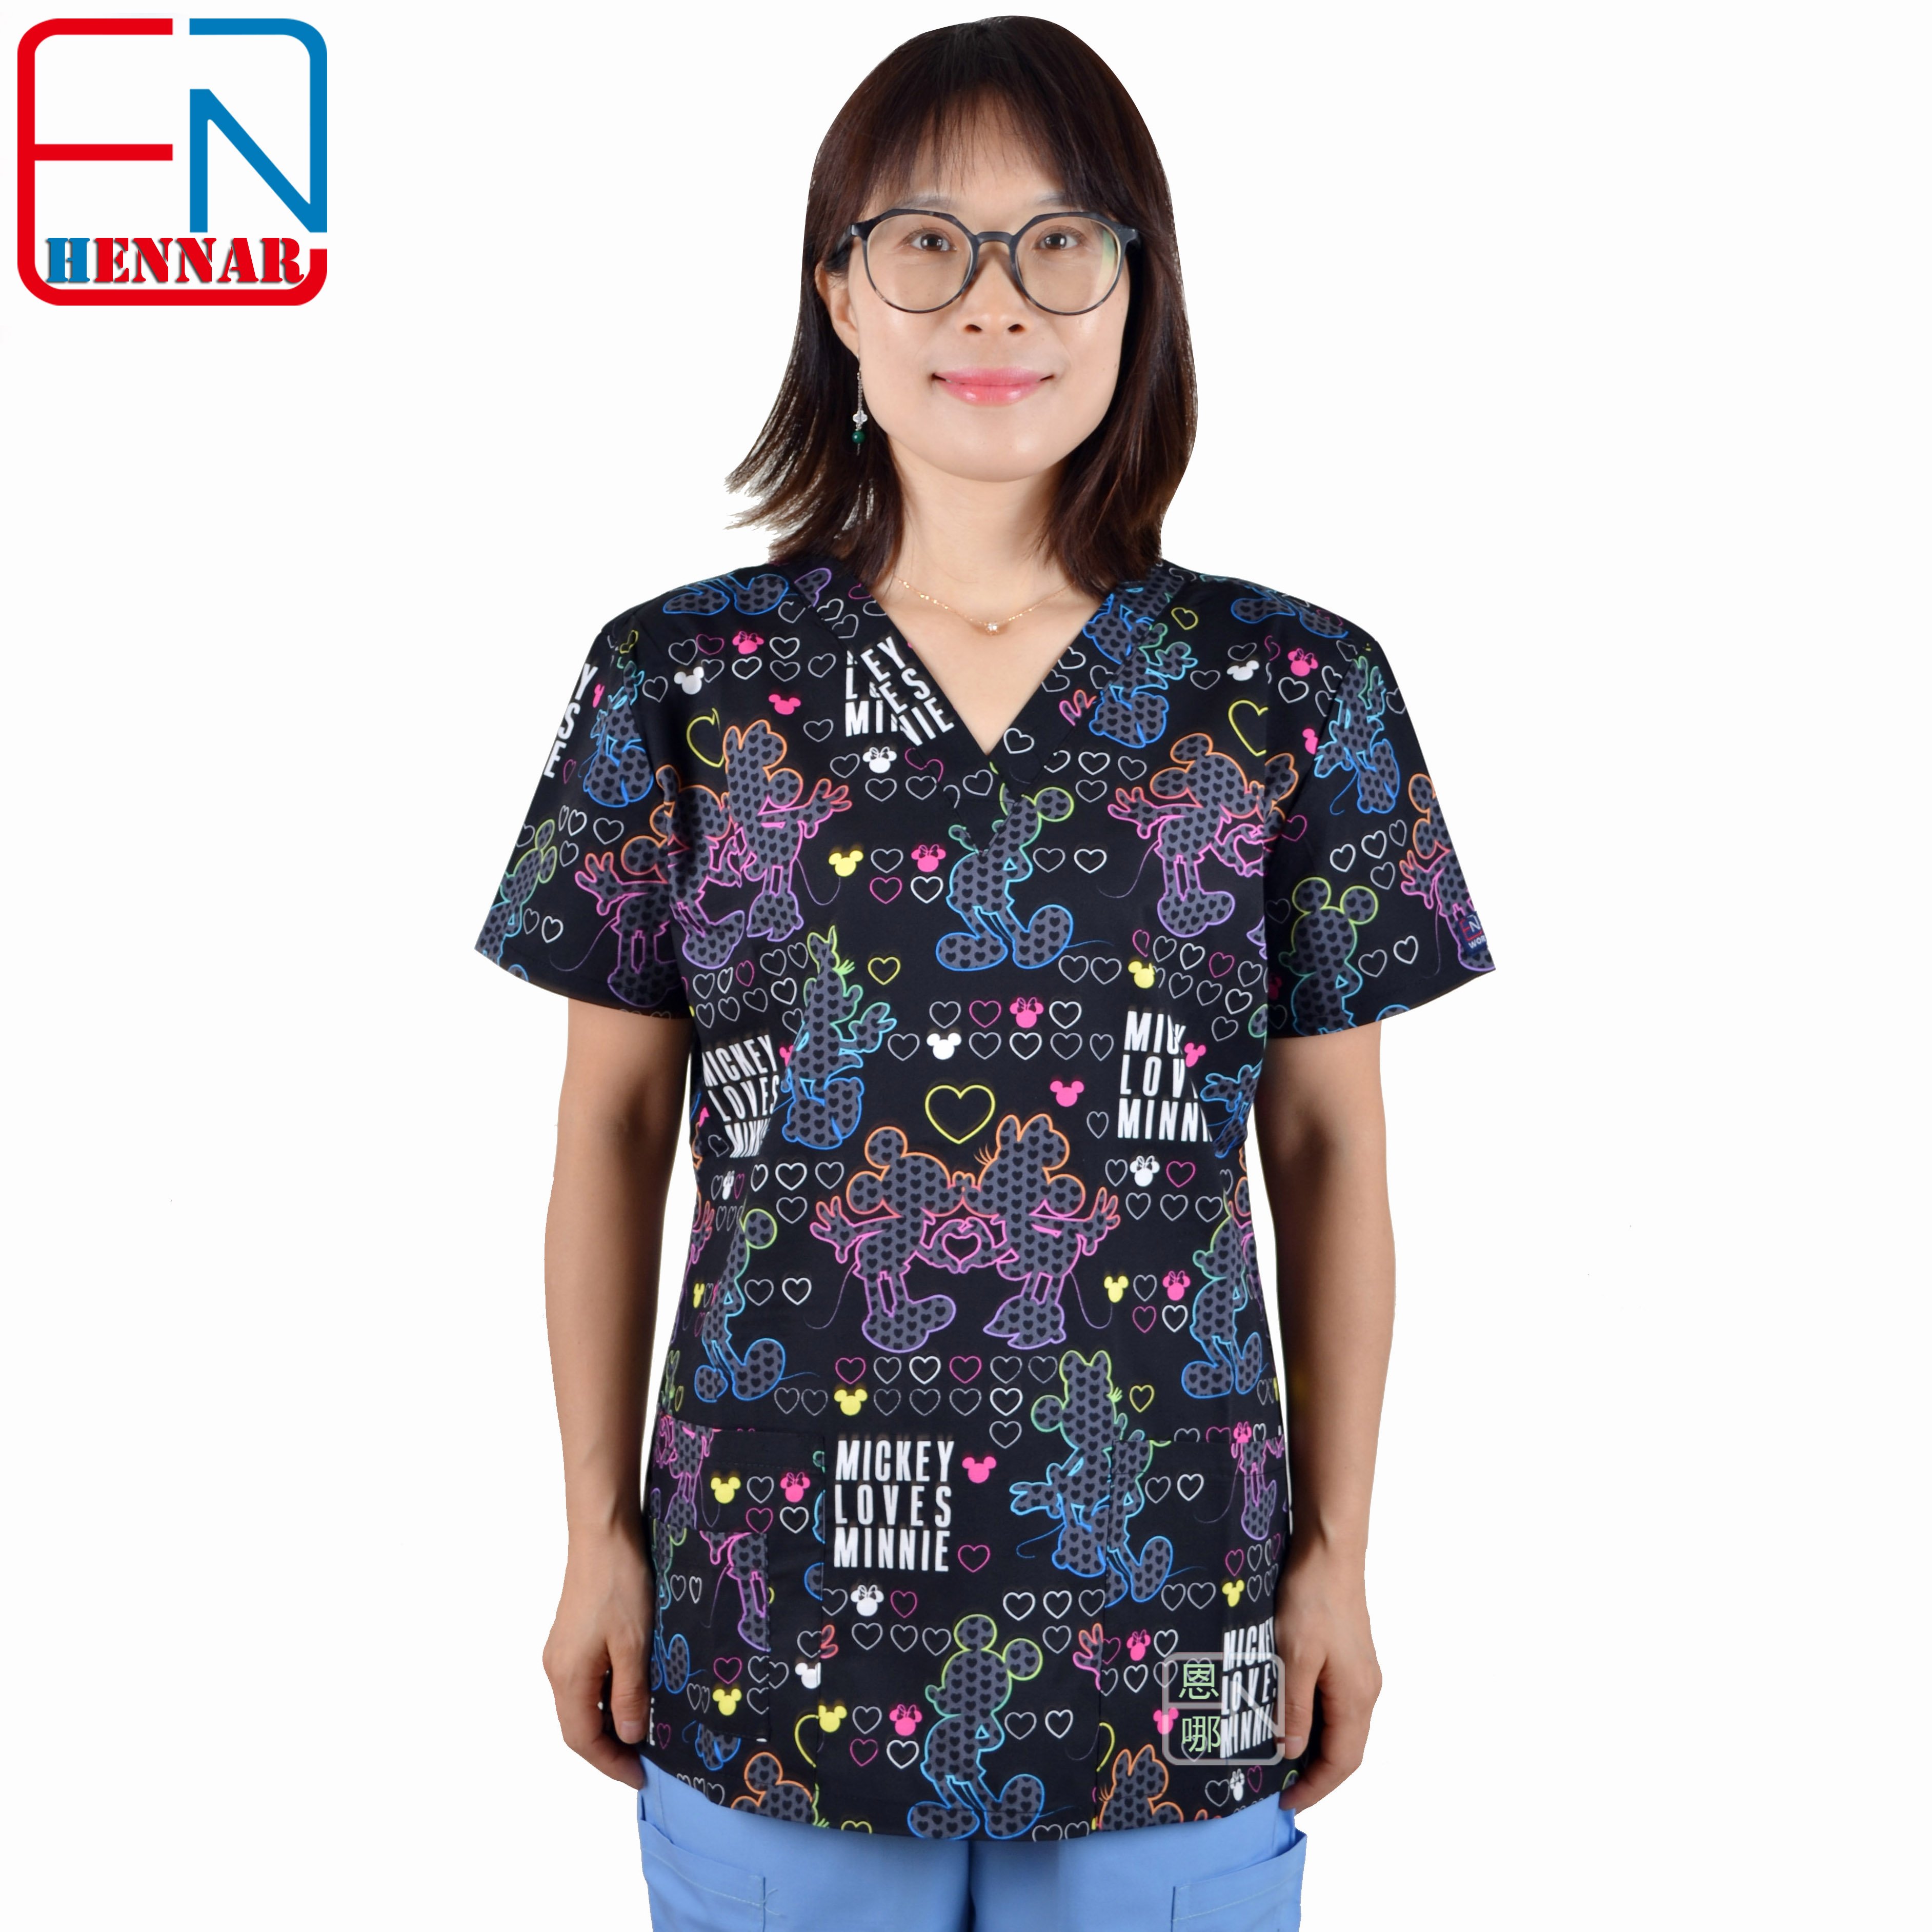 Hennar Women Scrub Tops Medical With V Neck 100% Cotton Surgical Short Sleeve Cartoon Print 2019 High Quality Scrubs Top Female